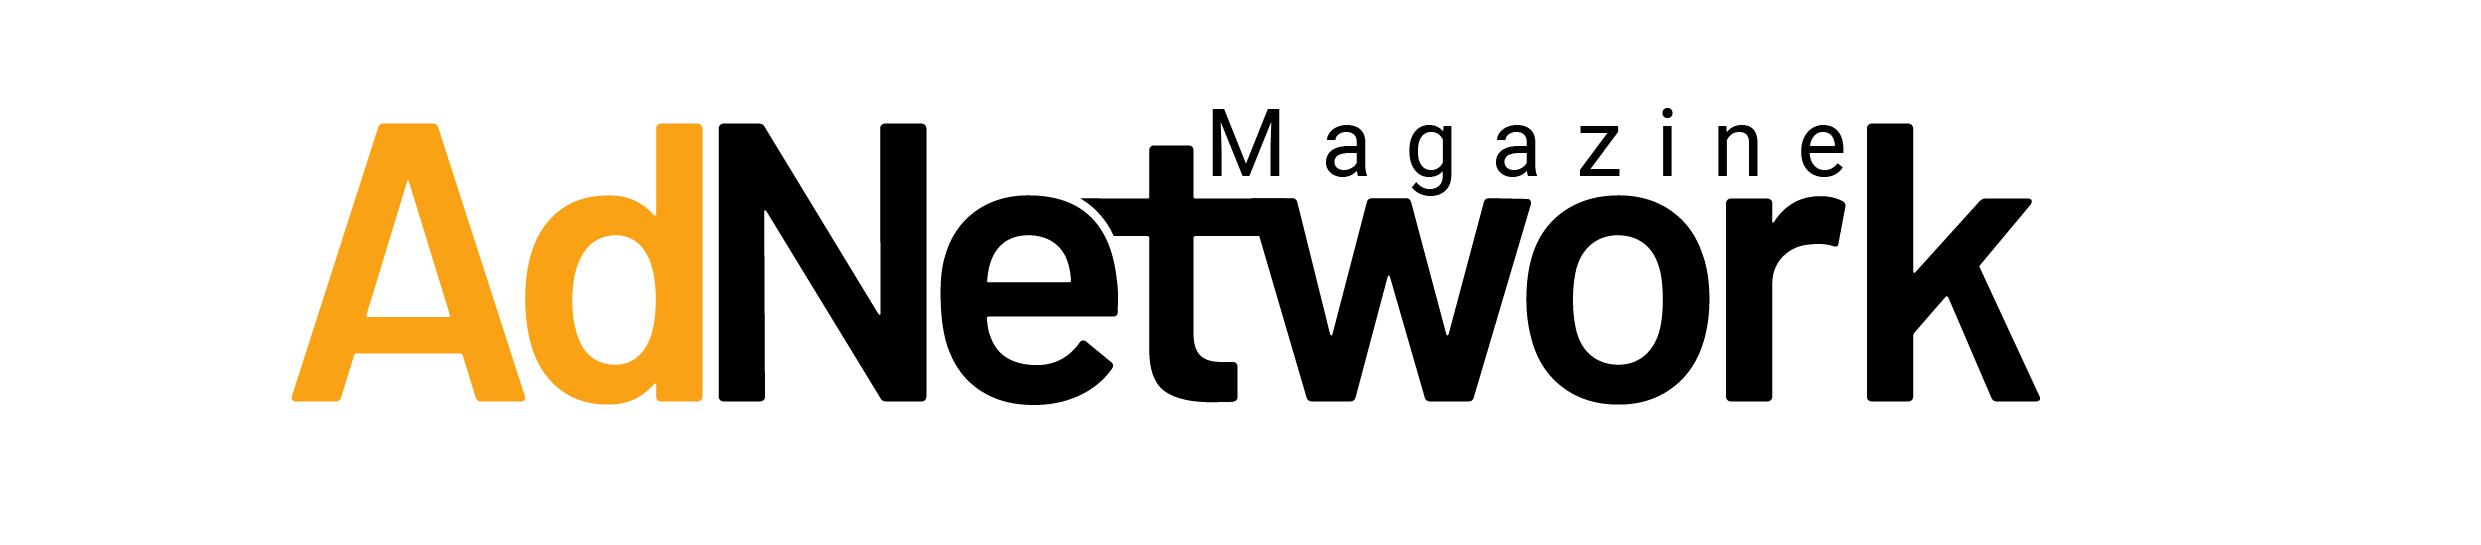 Ad Network Magazine